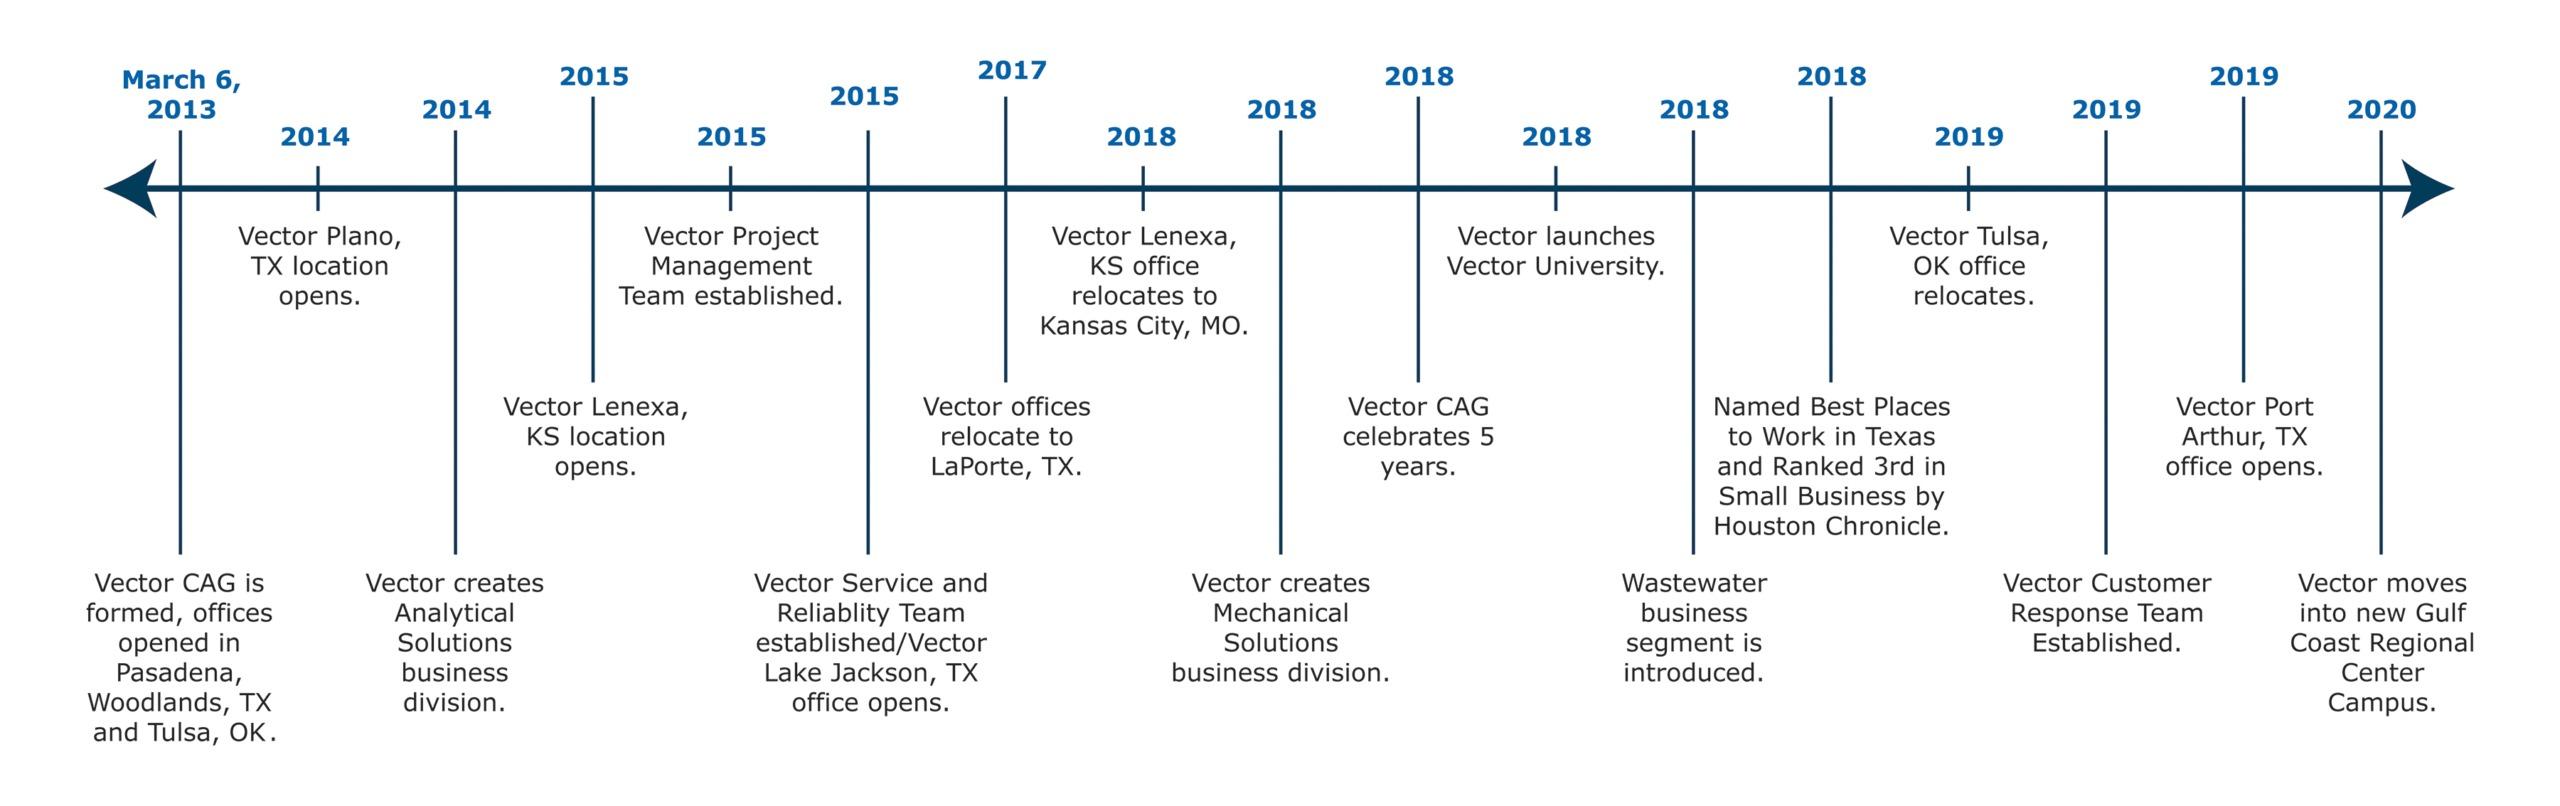 Vector History Timeline